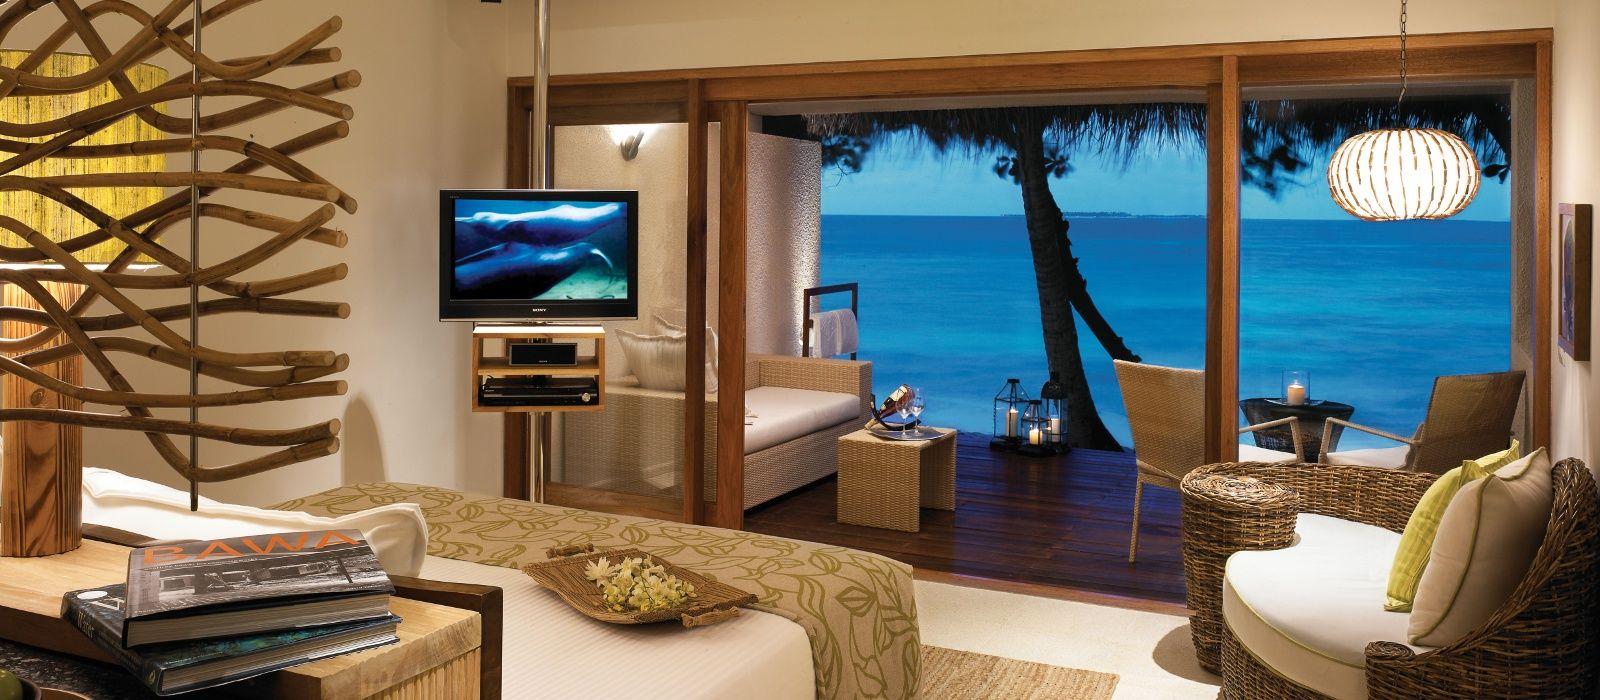 Hotel Vivanta by Taj – Coral Reef Maldives